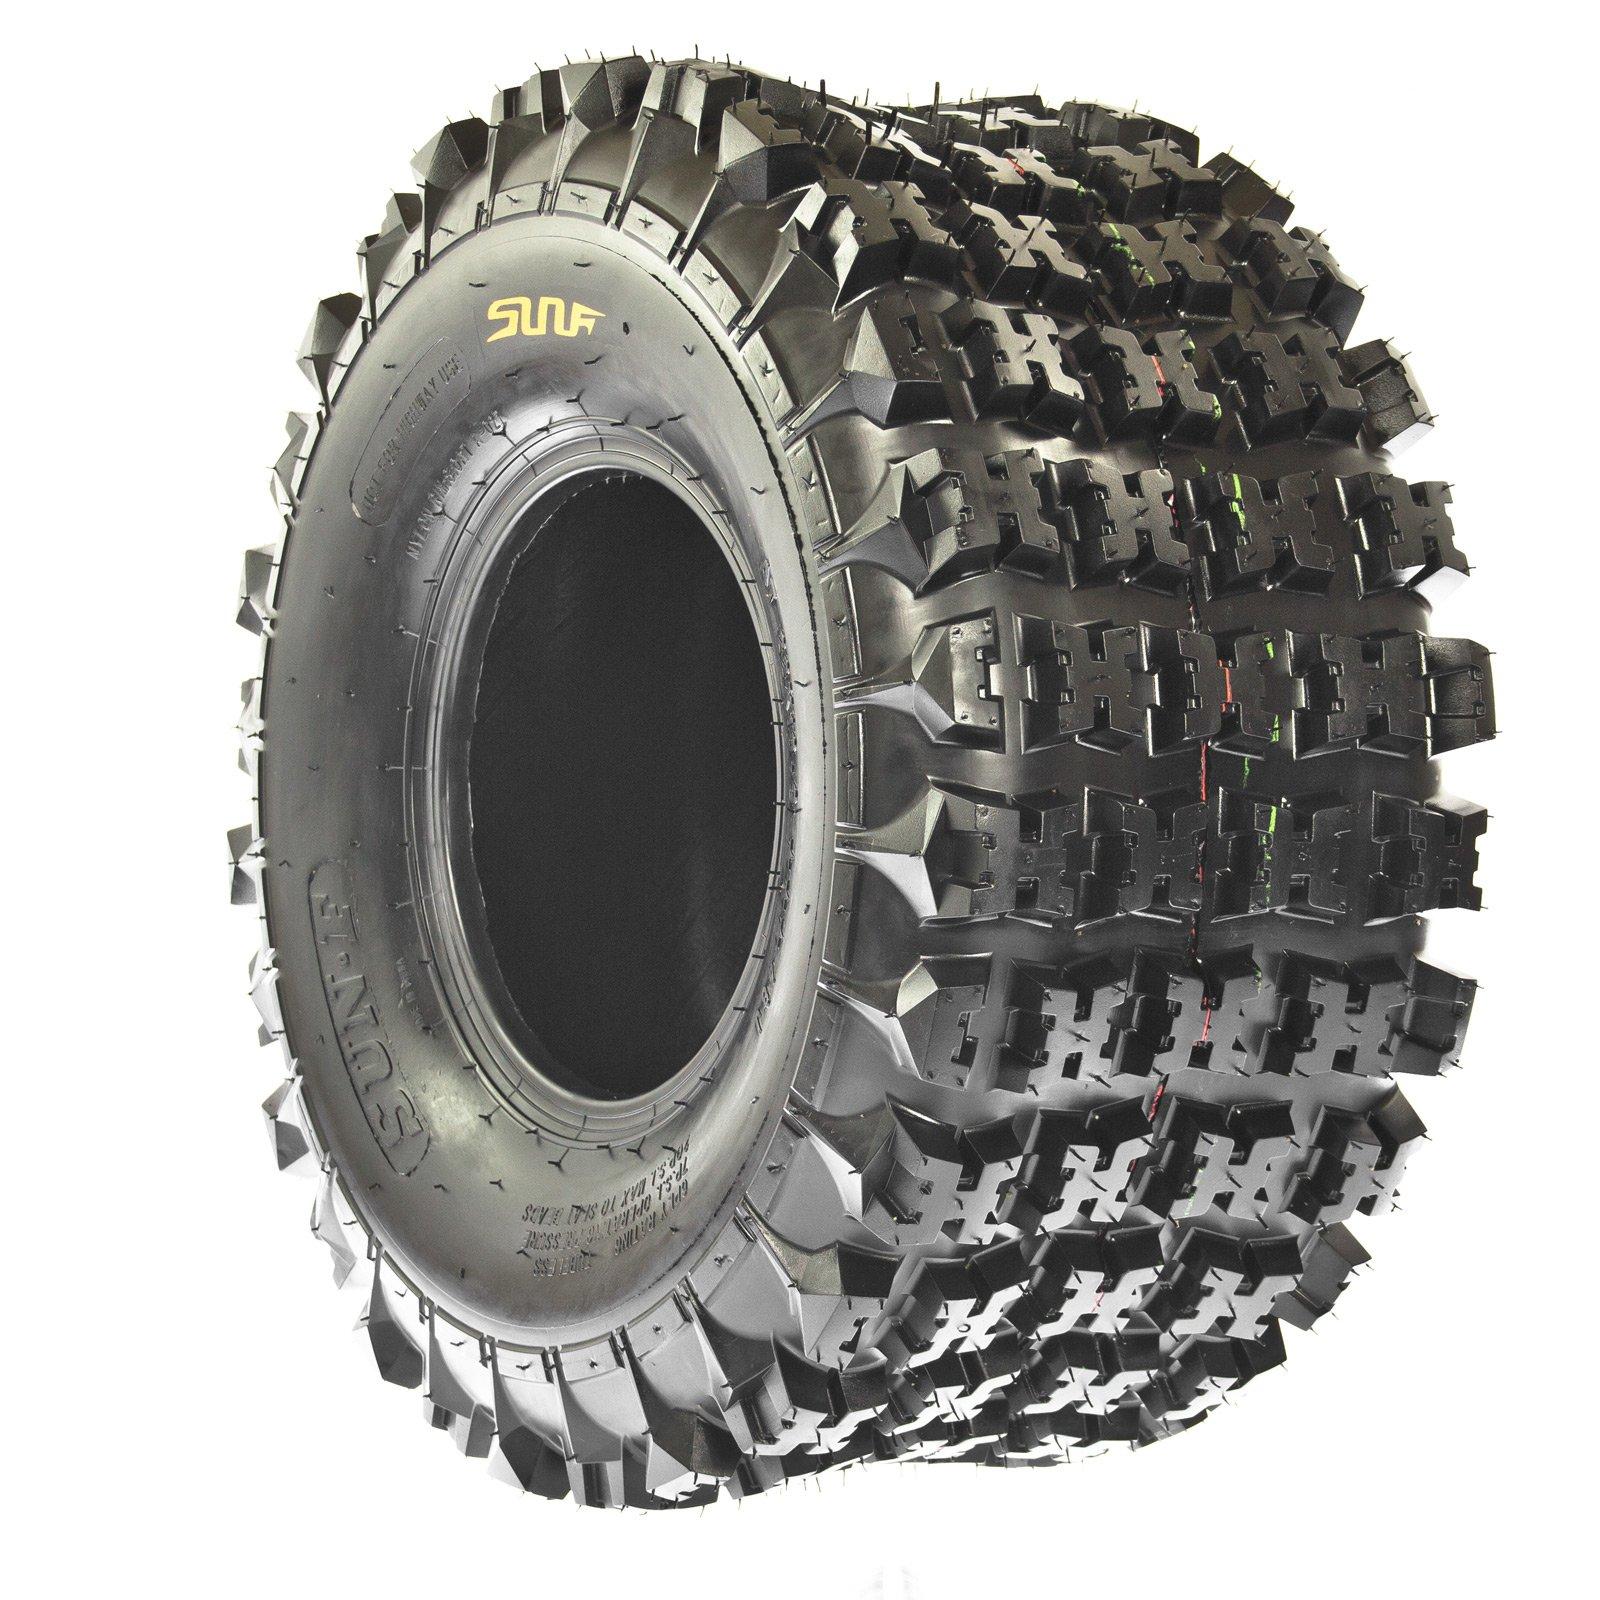 Set of 2 SunF A027 ATV Tire 22x11-9 Rear, 6 Ply by SunF (Image #5)